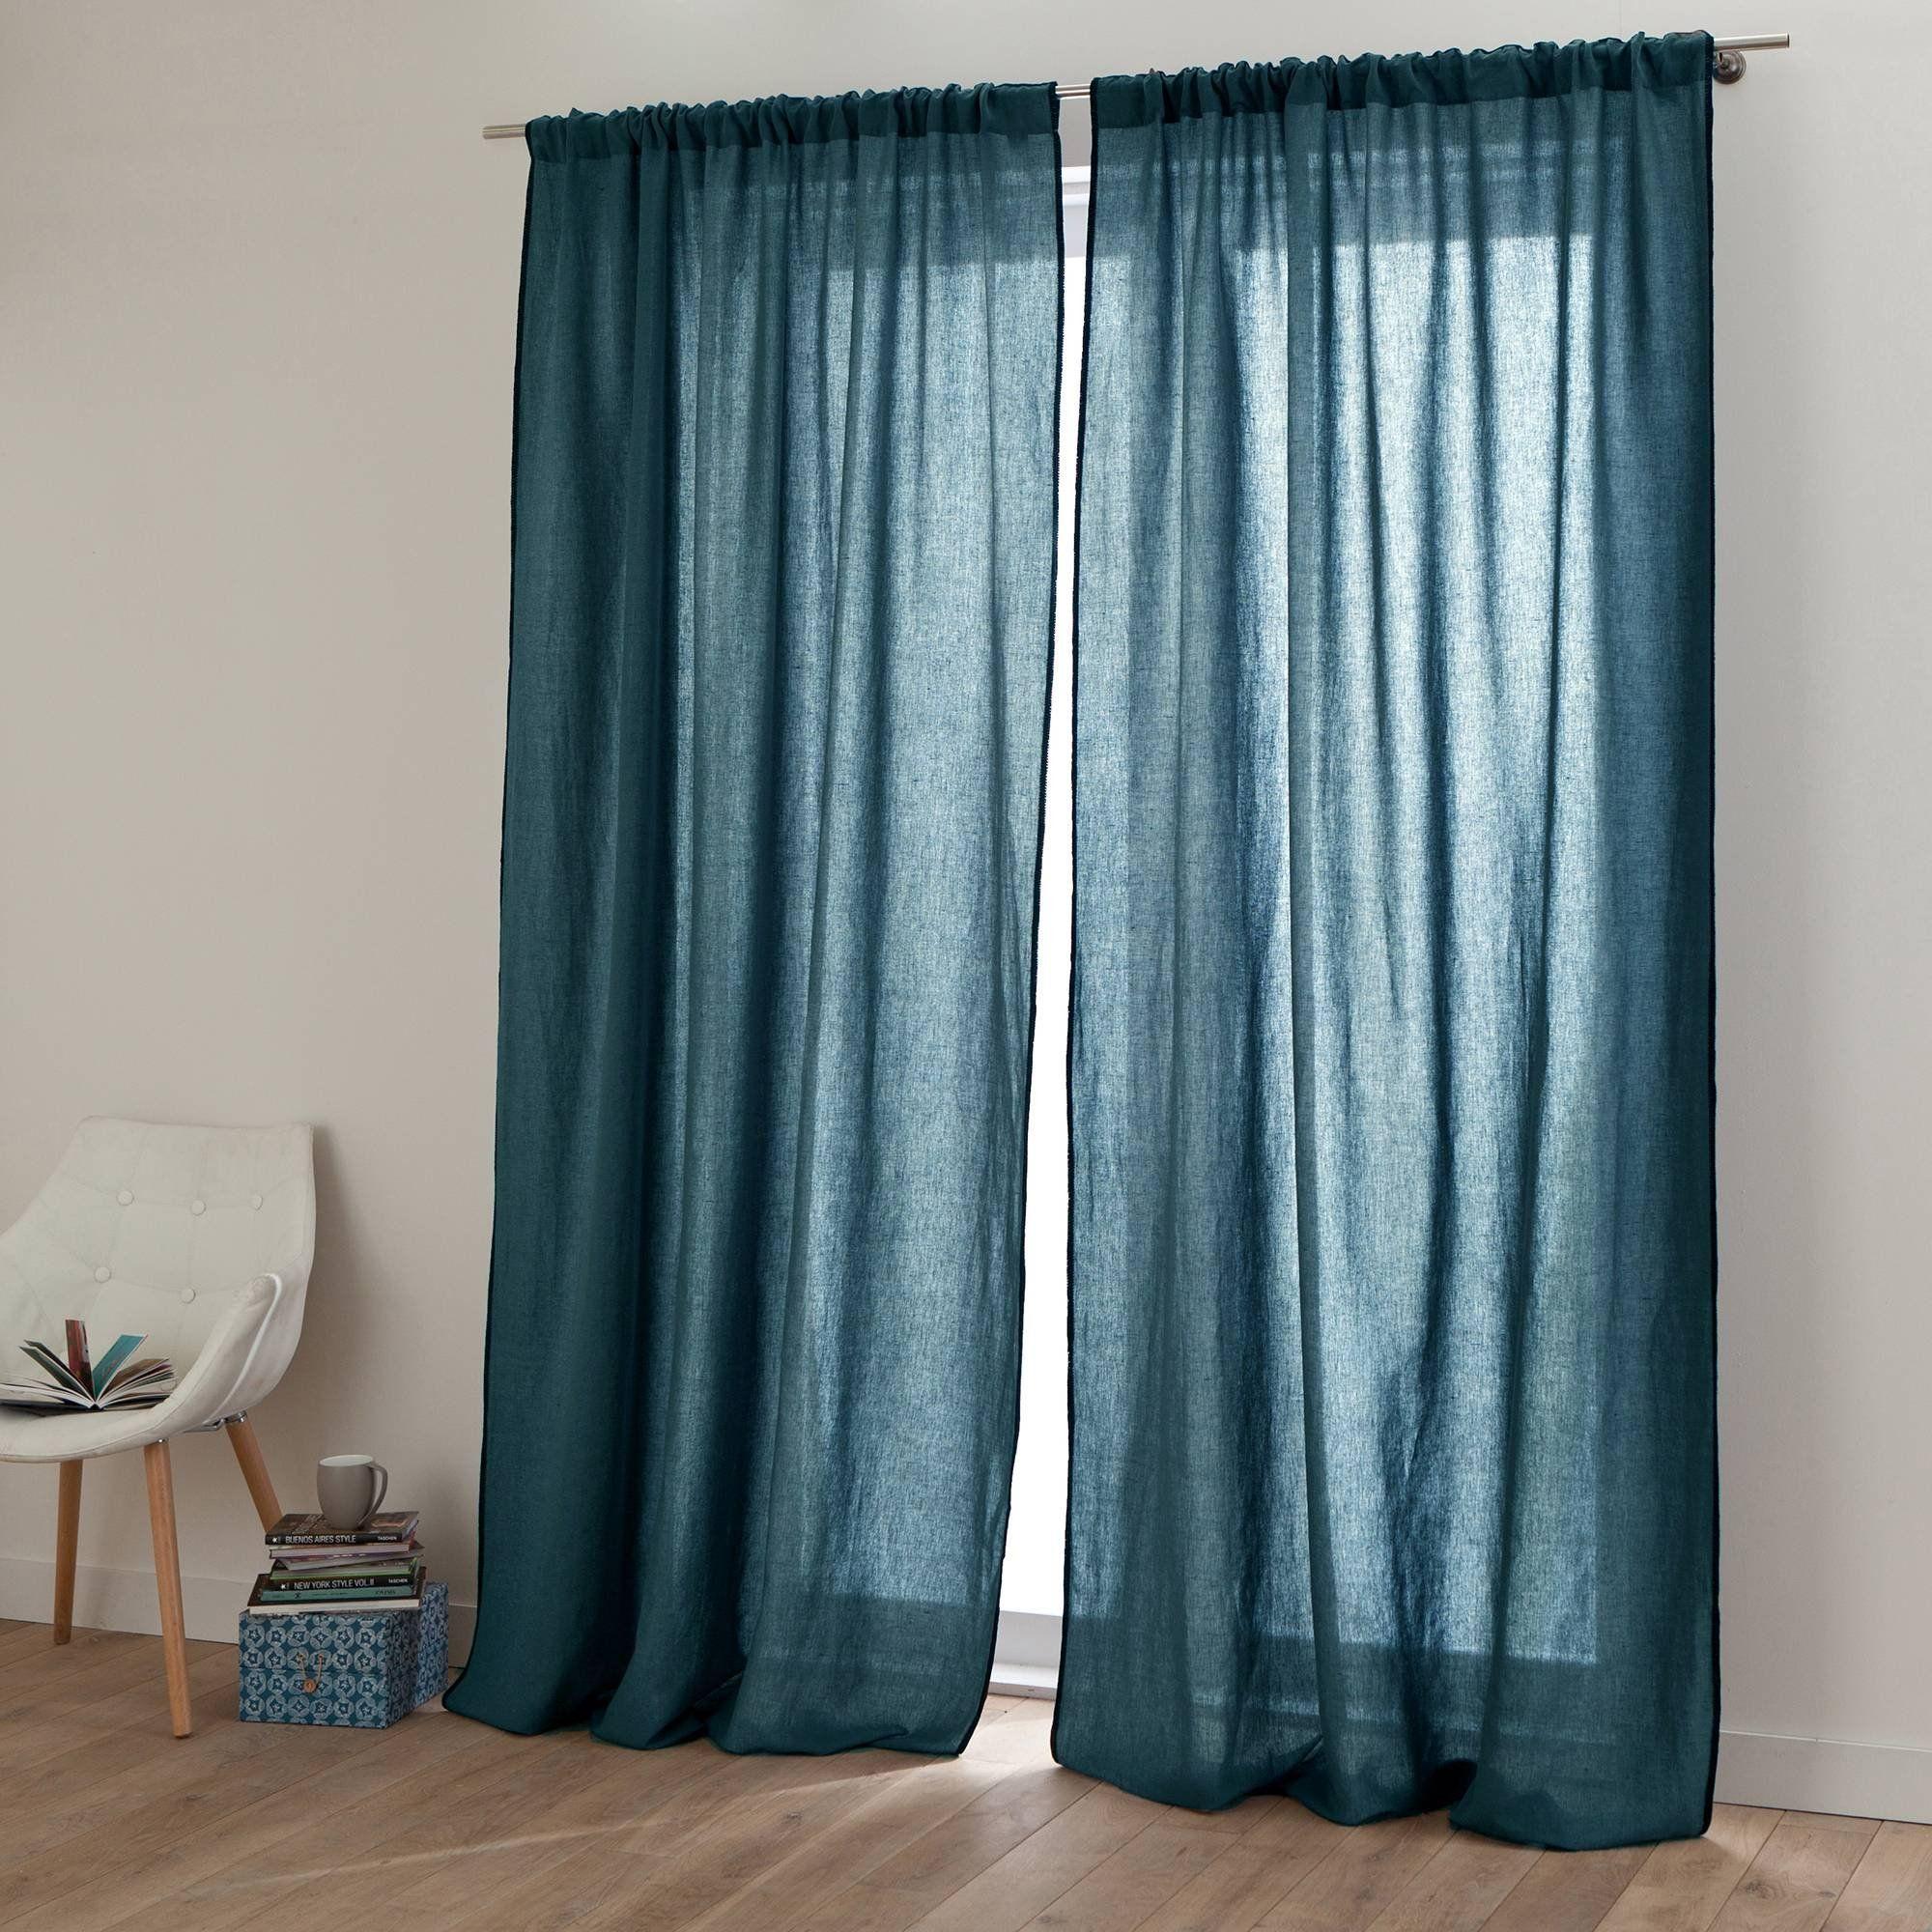 rideau lin lav stone wash et coton zilia harmony appt mc bidart pinterest rideau lin lav. Black Bedroom Furniture Sets. Home Design Ideas